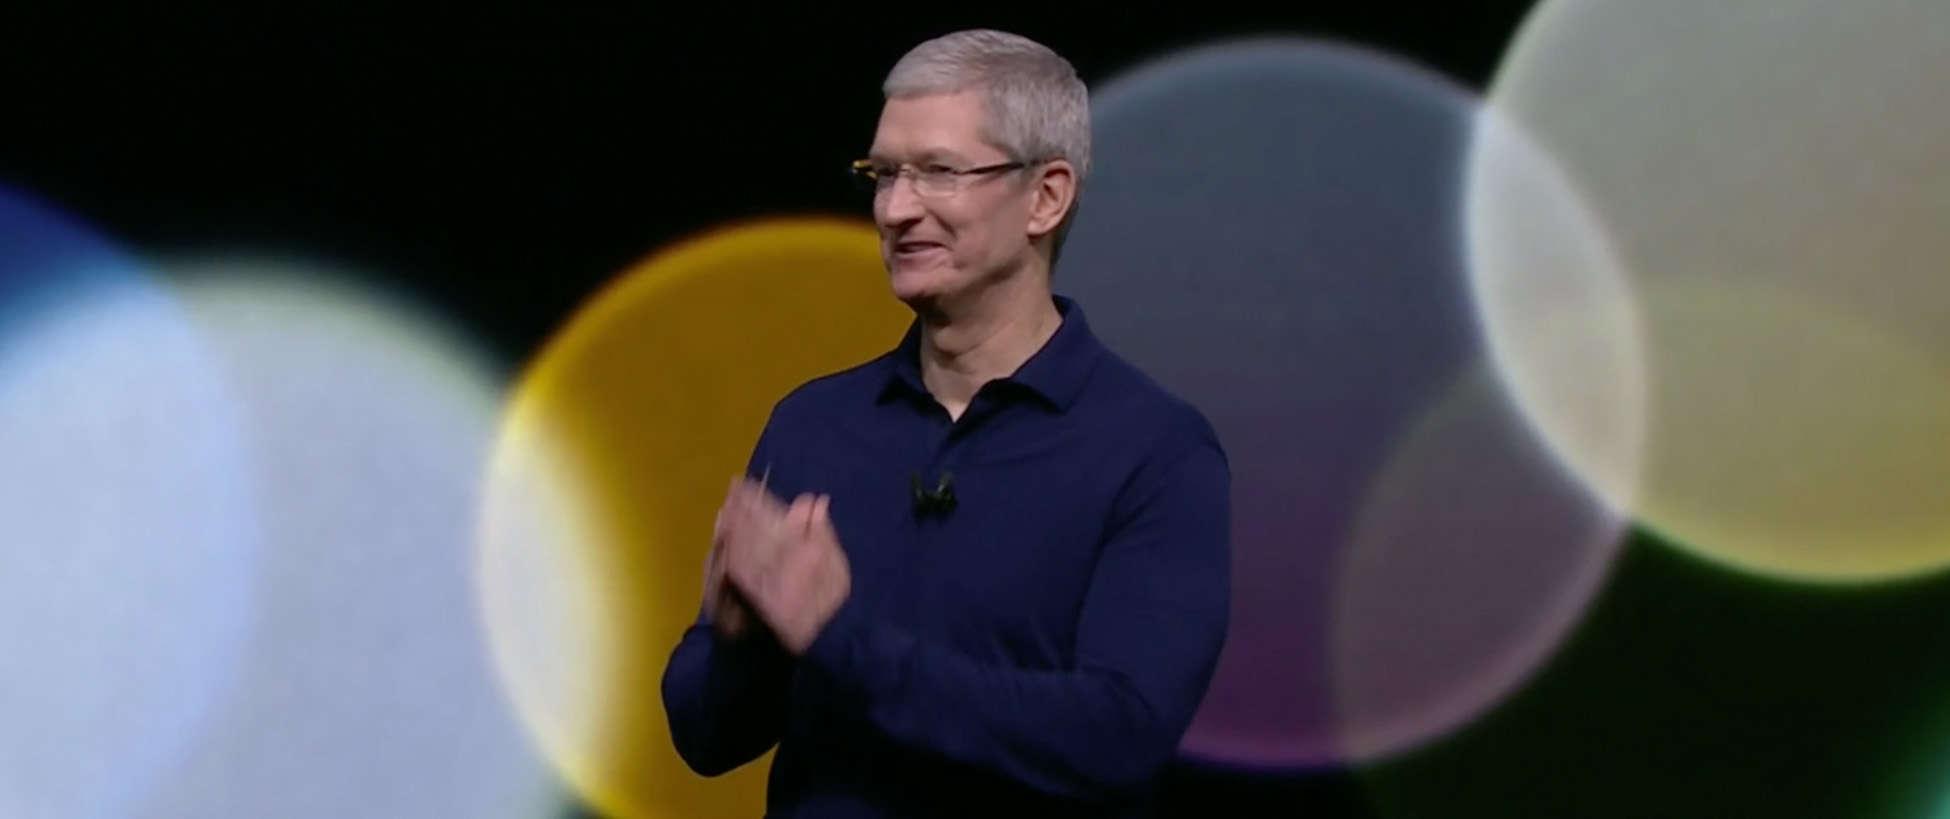 Tim Cook iPhone 7 event